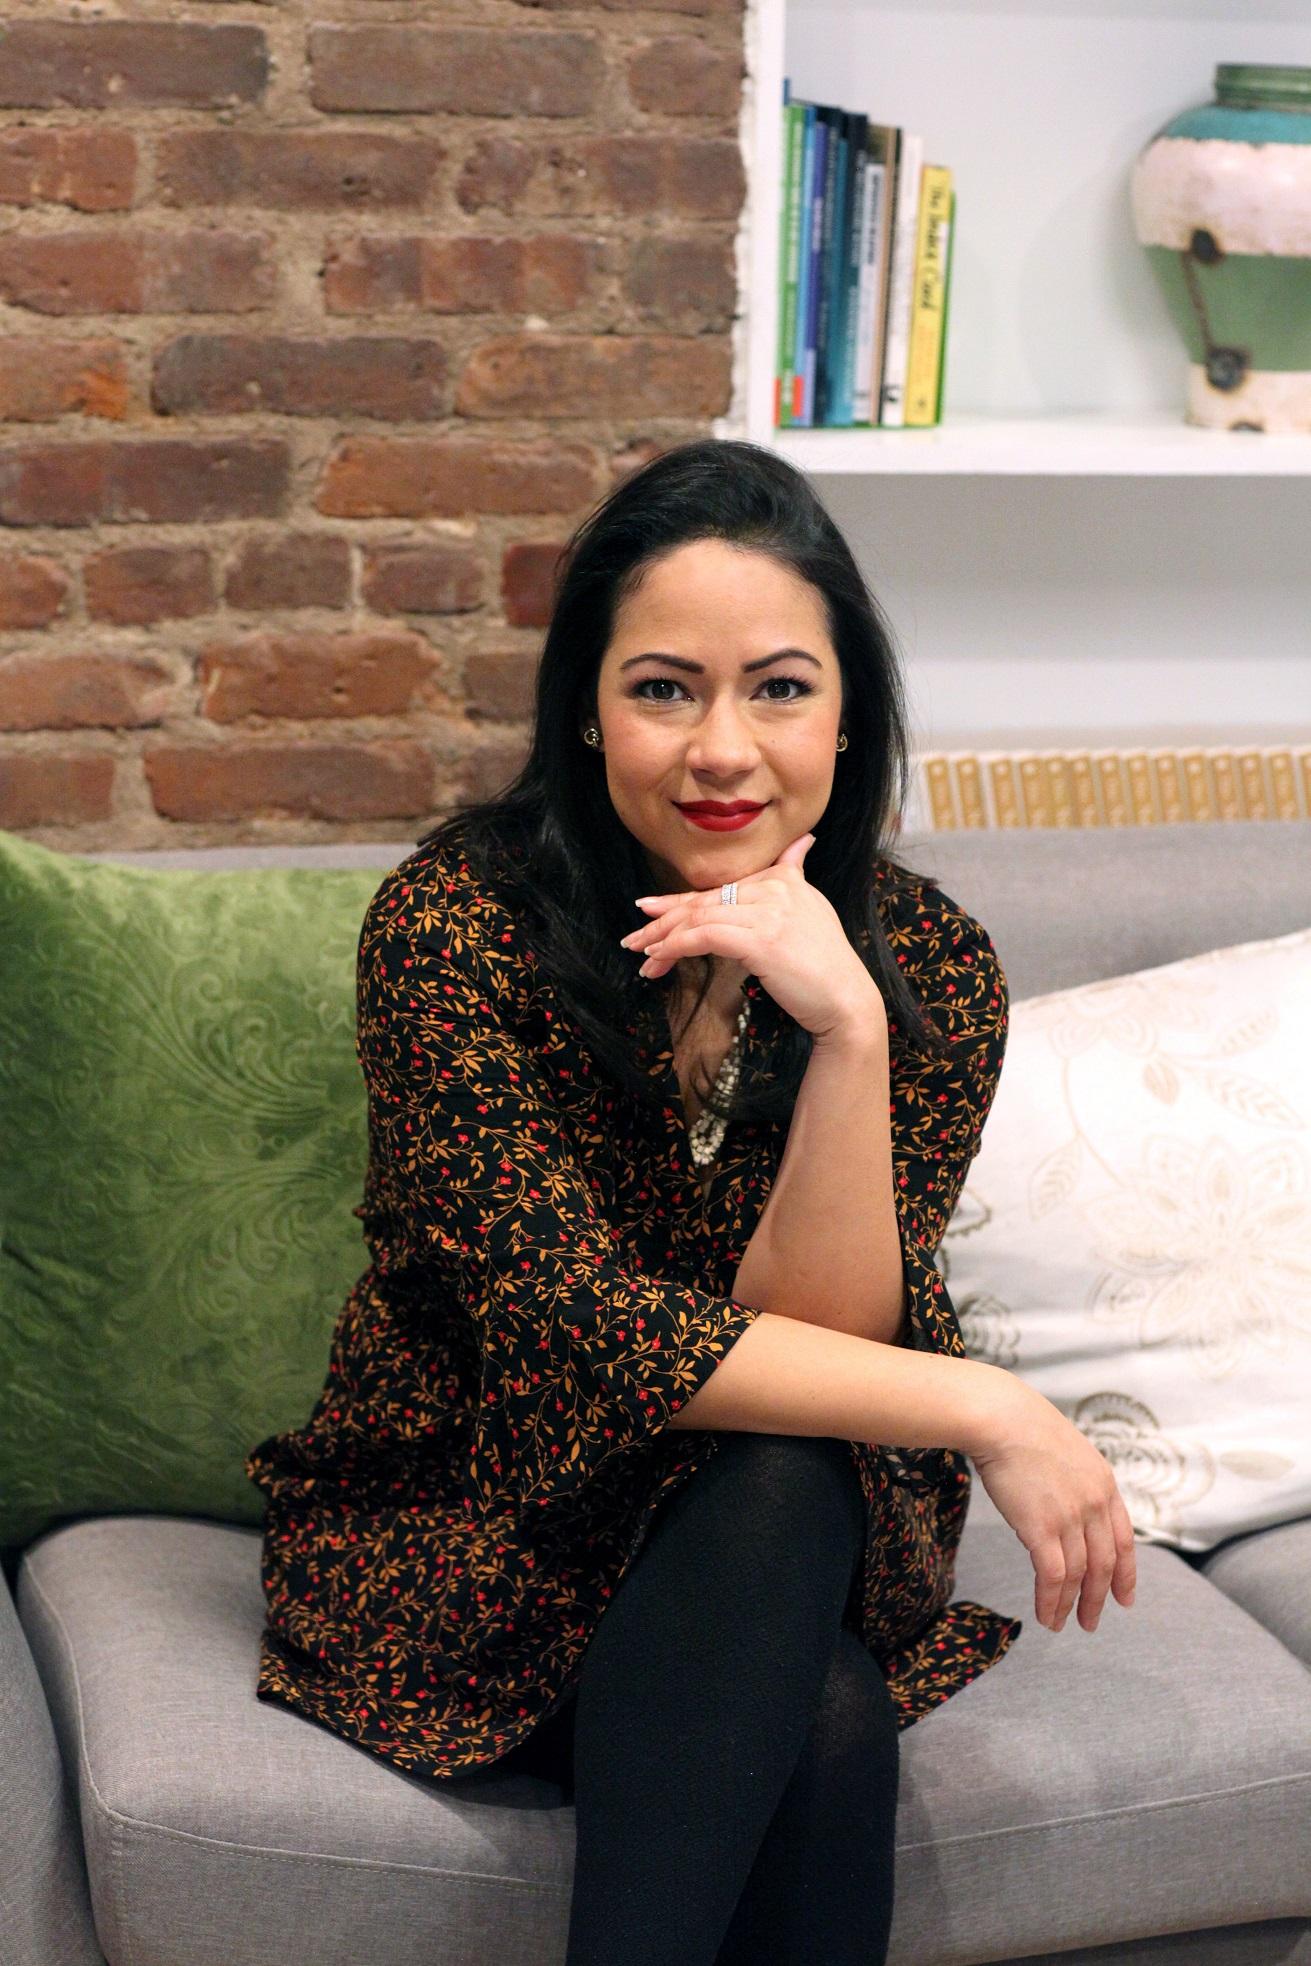 Yai Vargas in her office